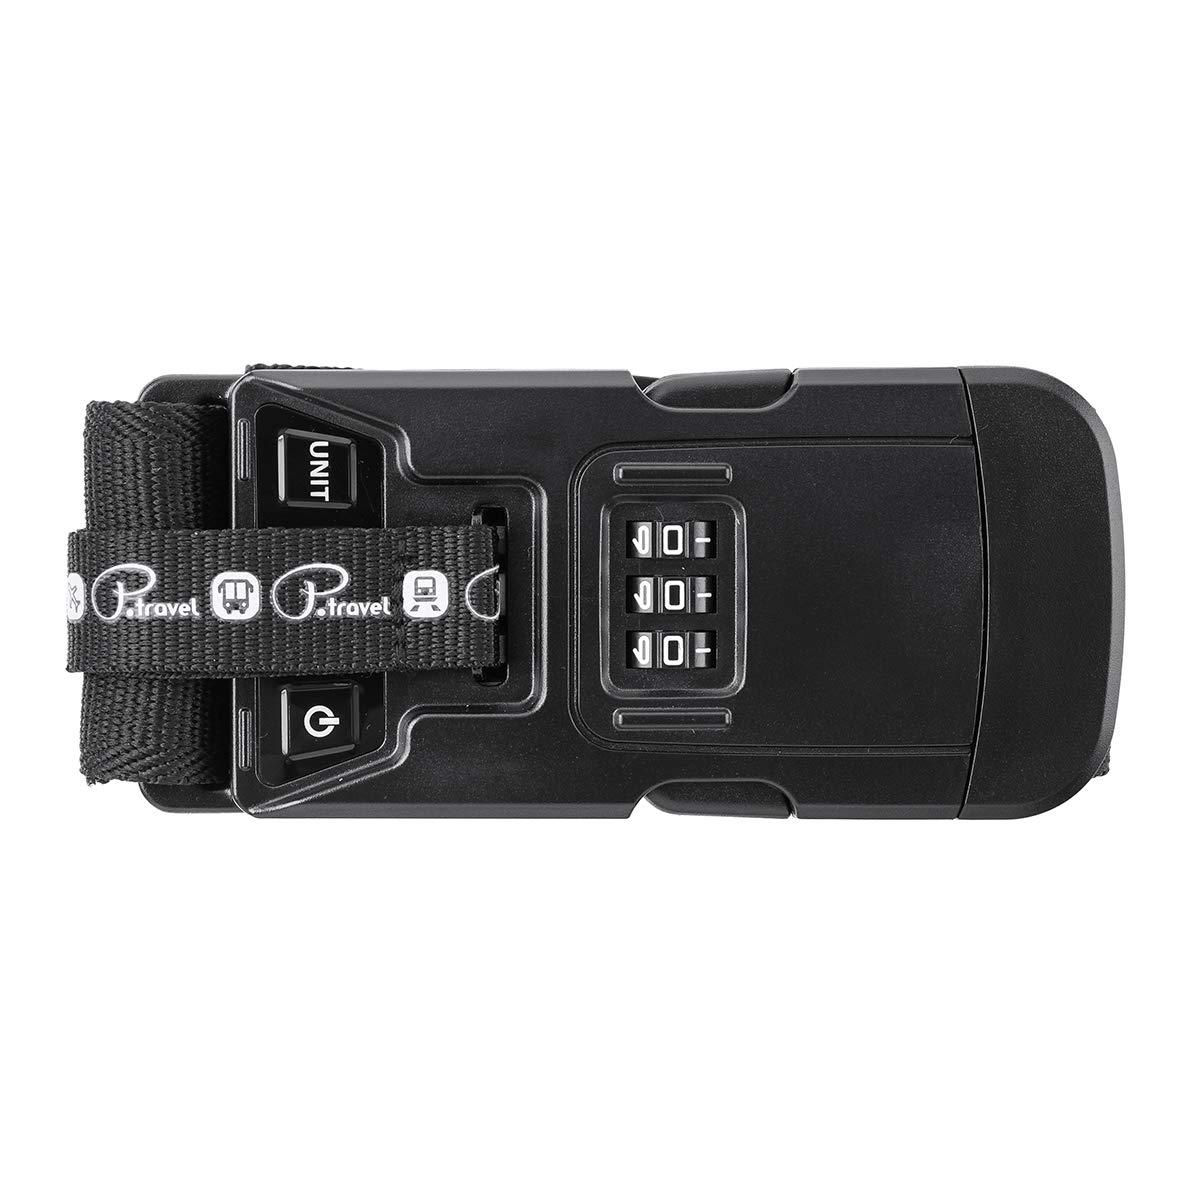 HOCOSY 3 合 1 行李箱比例,可调节弹性行李带,手提箱包装带 3 位数密码锁,数字比例功能,手提箱包装带,旅行配件